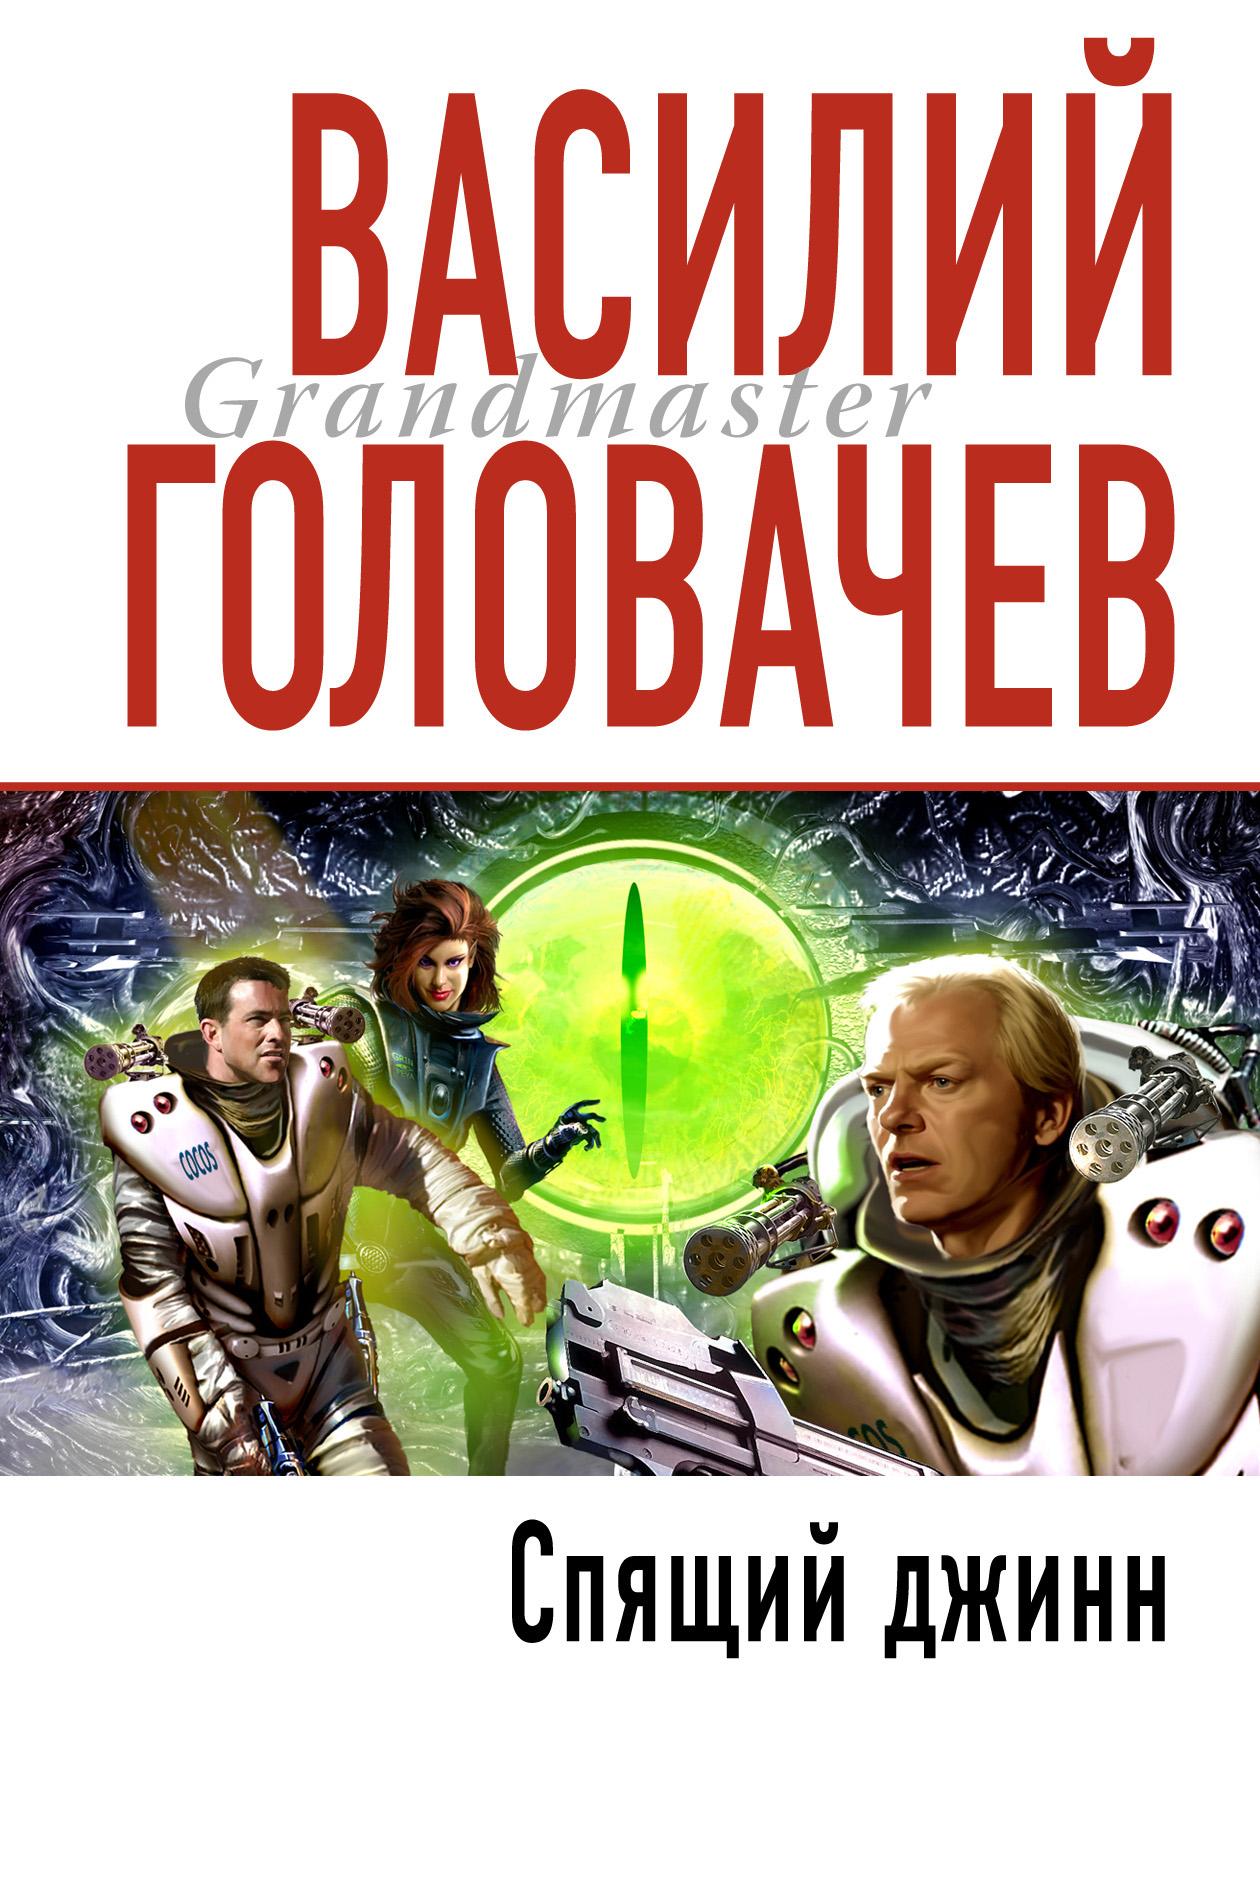 Василий Головачев Спящий джинн василий головачев марсианский корабль